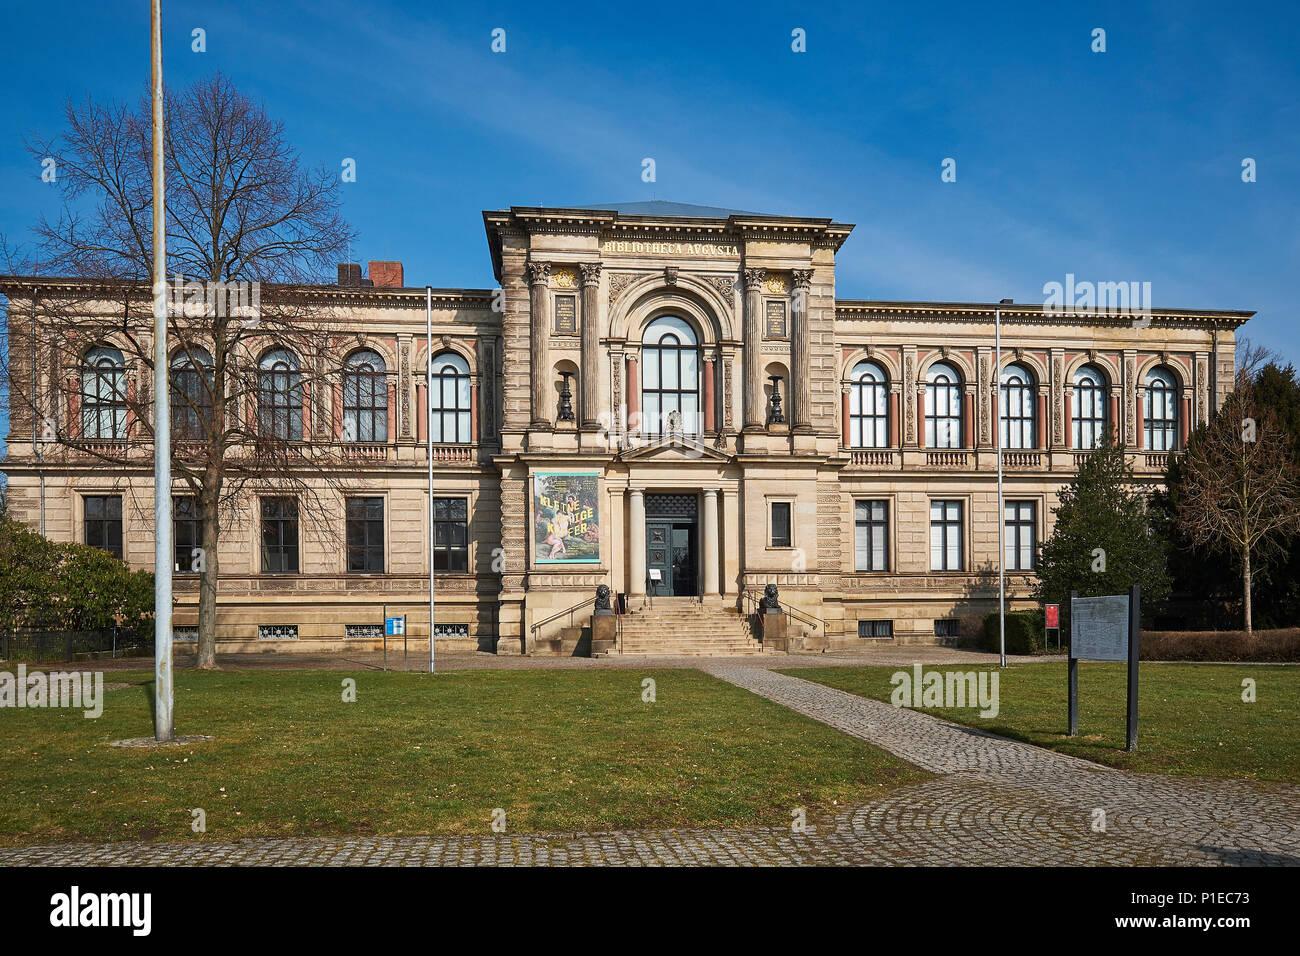 Herzog August Library in Wolfenbüttel, Lower Saxony, Germany Stock Photo